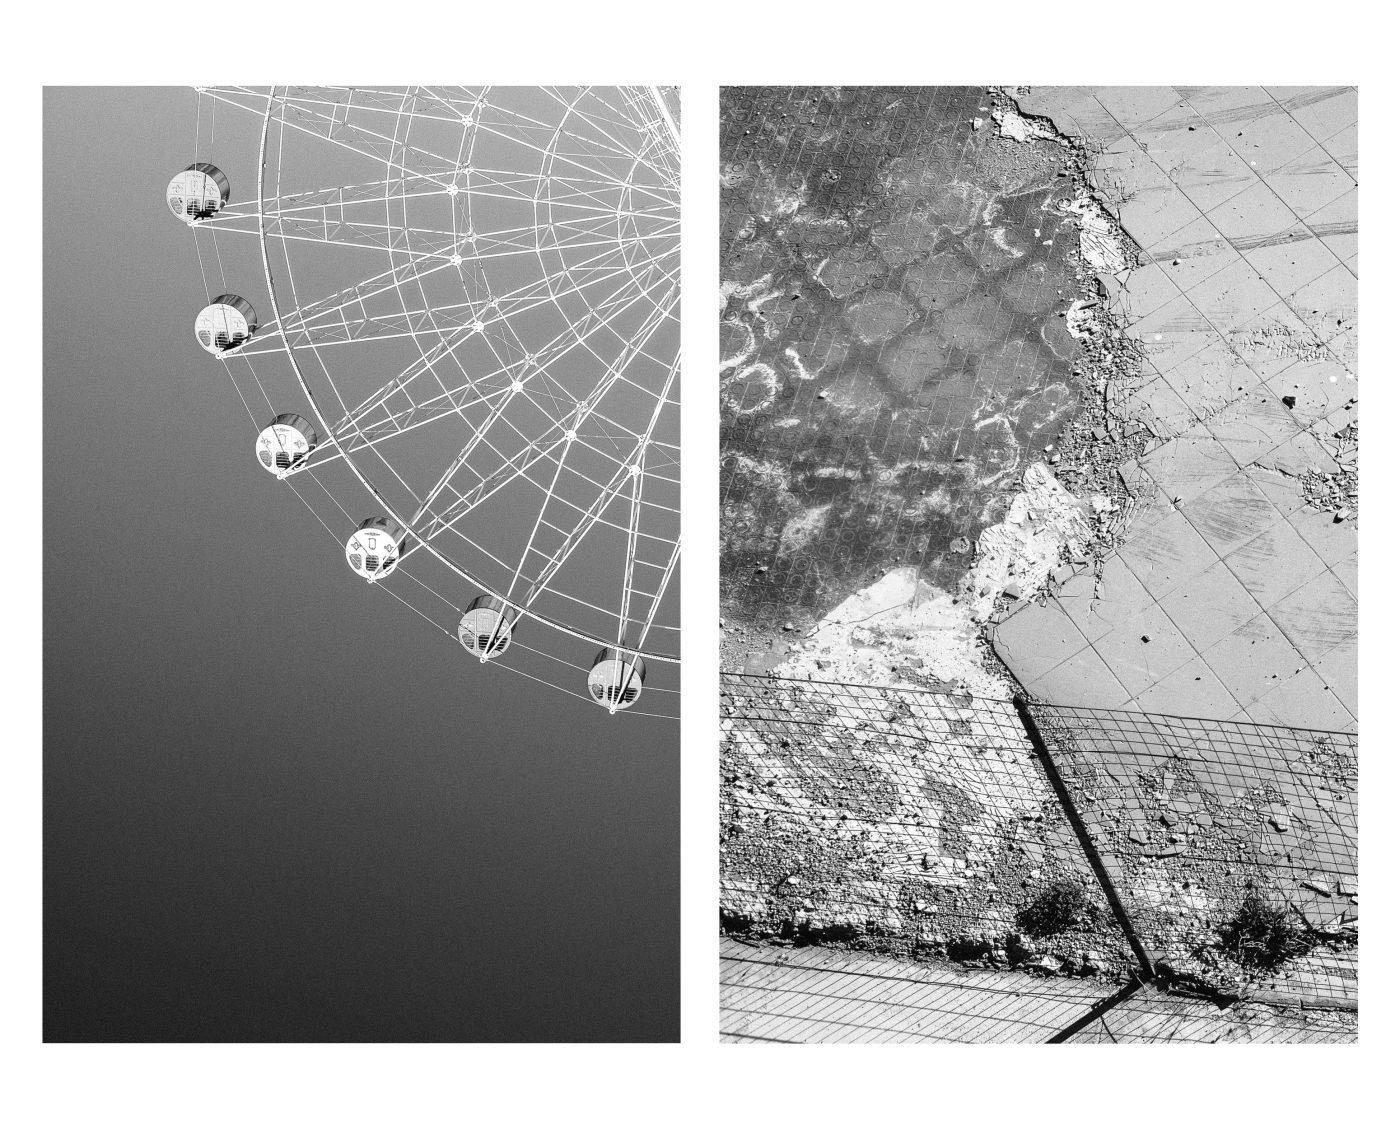 iGNANT-Photography-Antonio-Privitera-La-Nostalgia-14